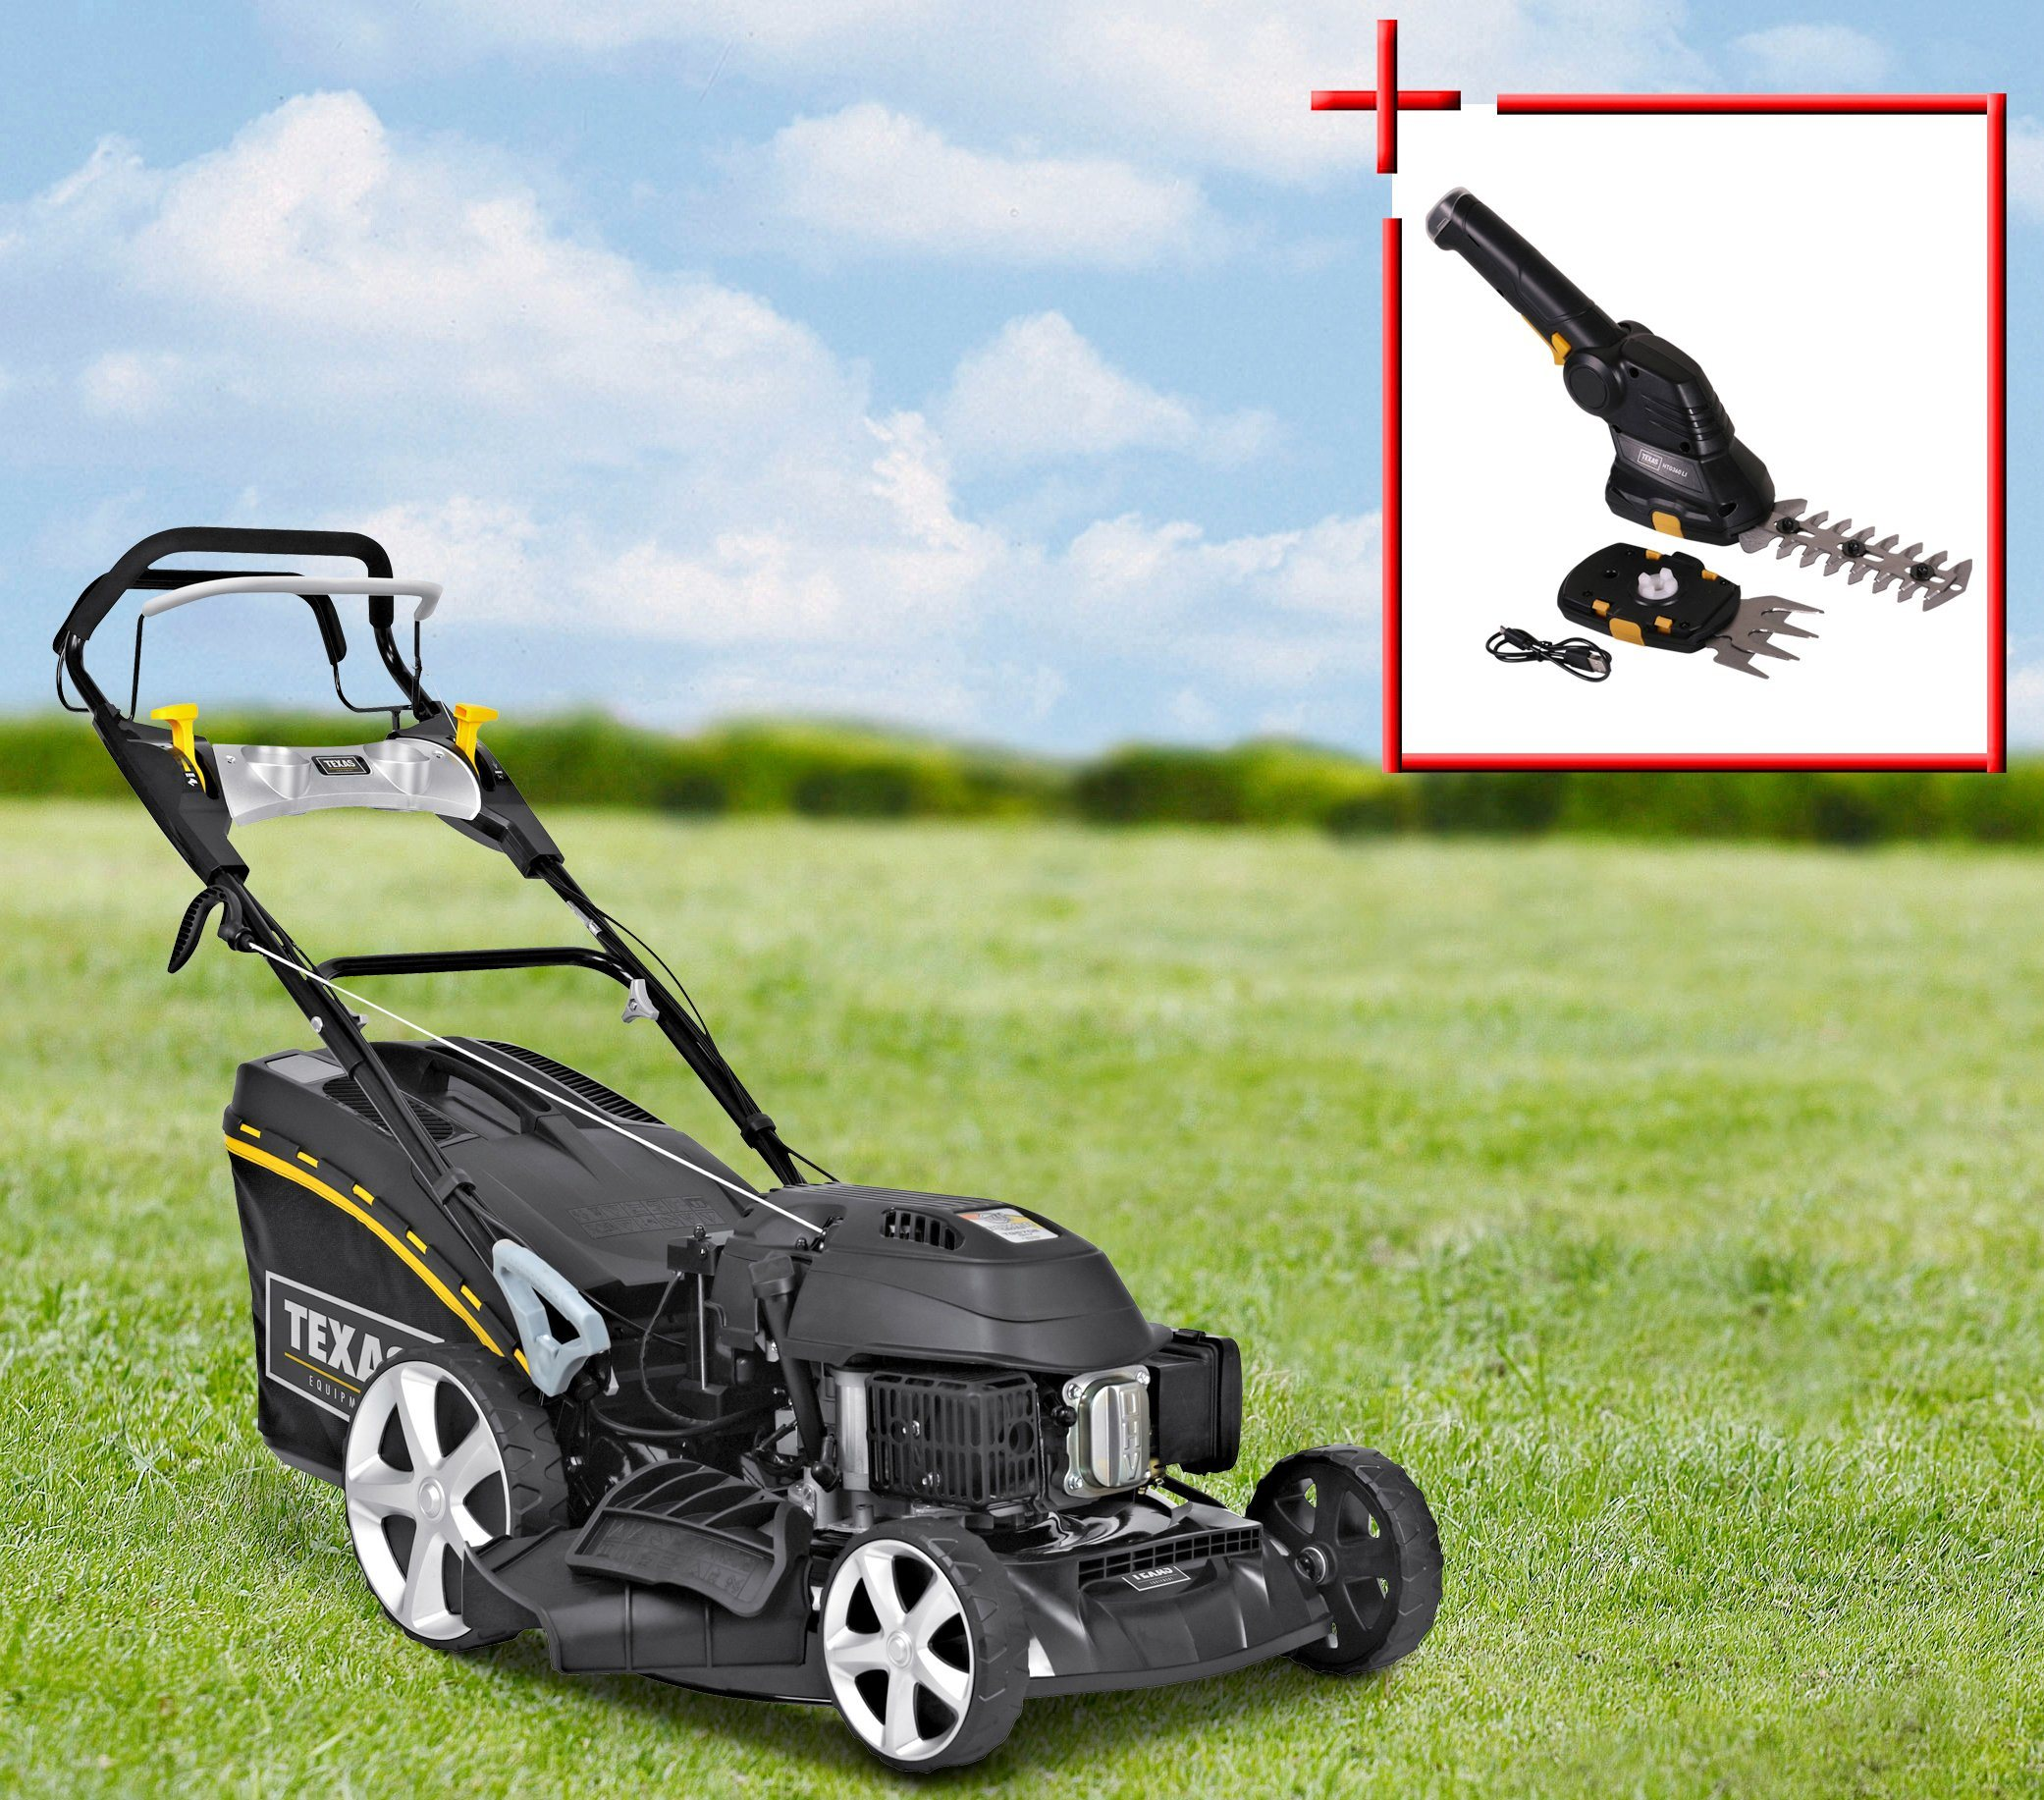 TEXAS Benzin-Rasenmäher »Razor 5150TR/WE«, 51 cm Schnittbreite | Garten > Rasenmäher und Rasentraktoren | Texas